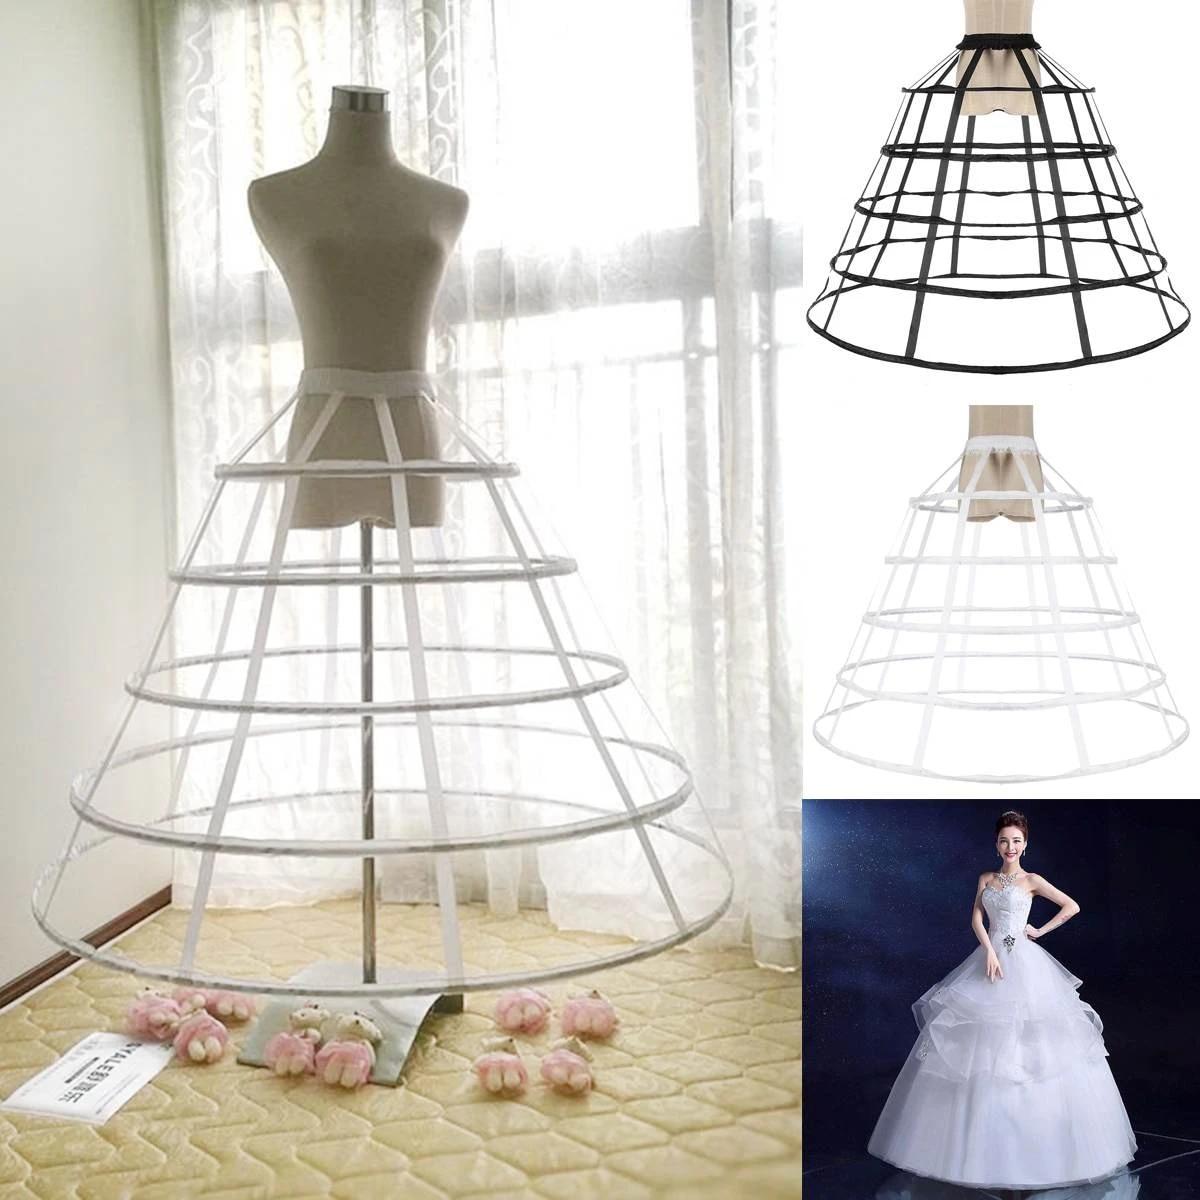 Women Cage Wedding Bridal Dress Crinoline Ball Gown Pannier Petticoat 5 Hoop